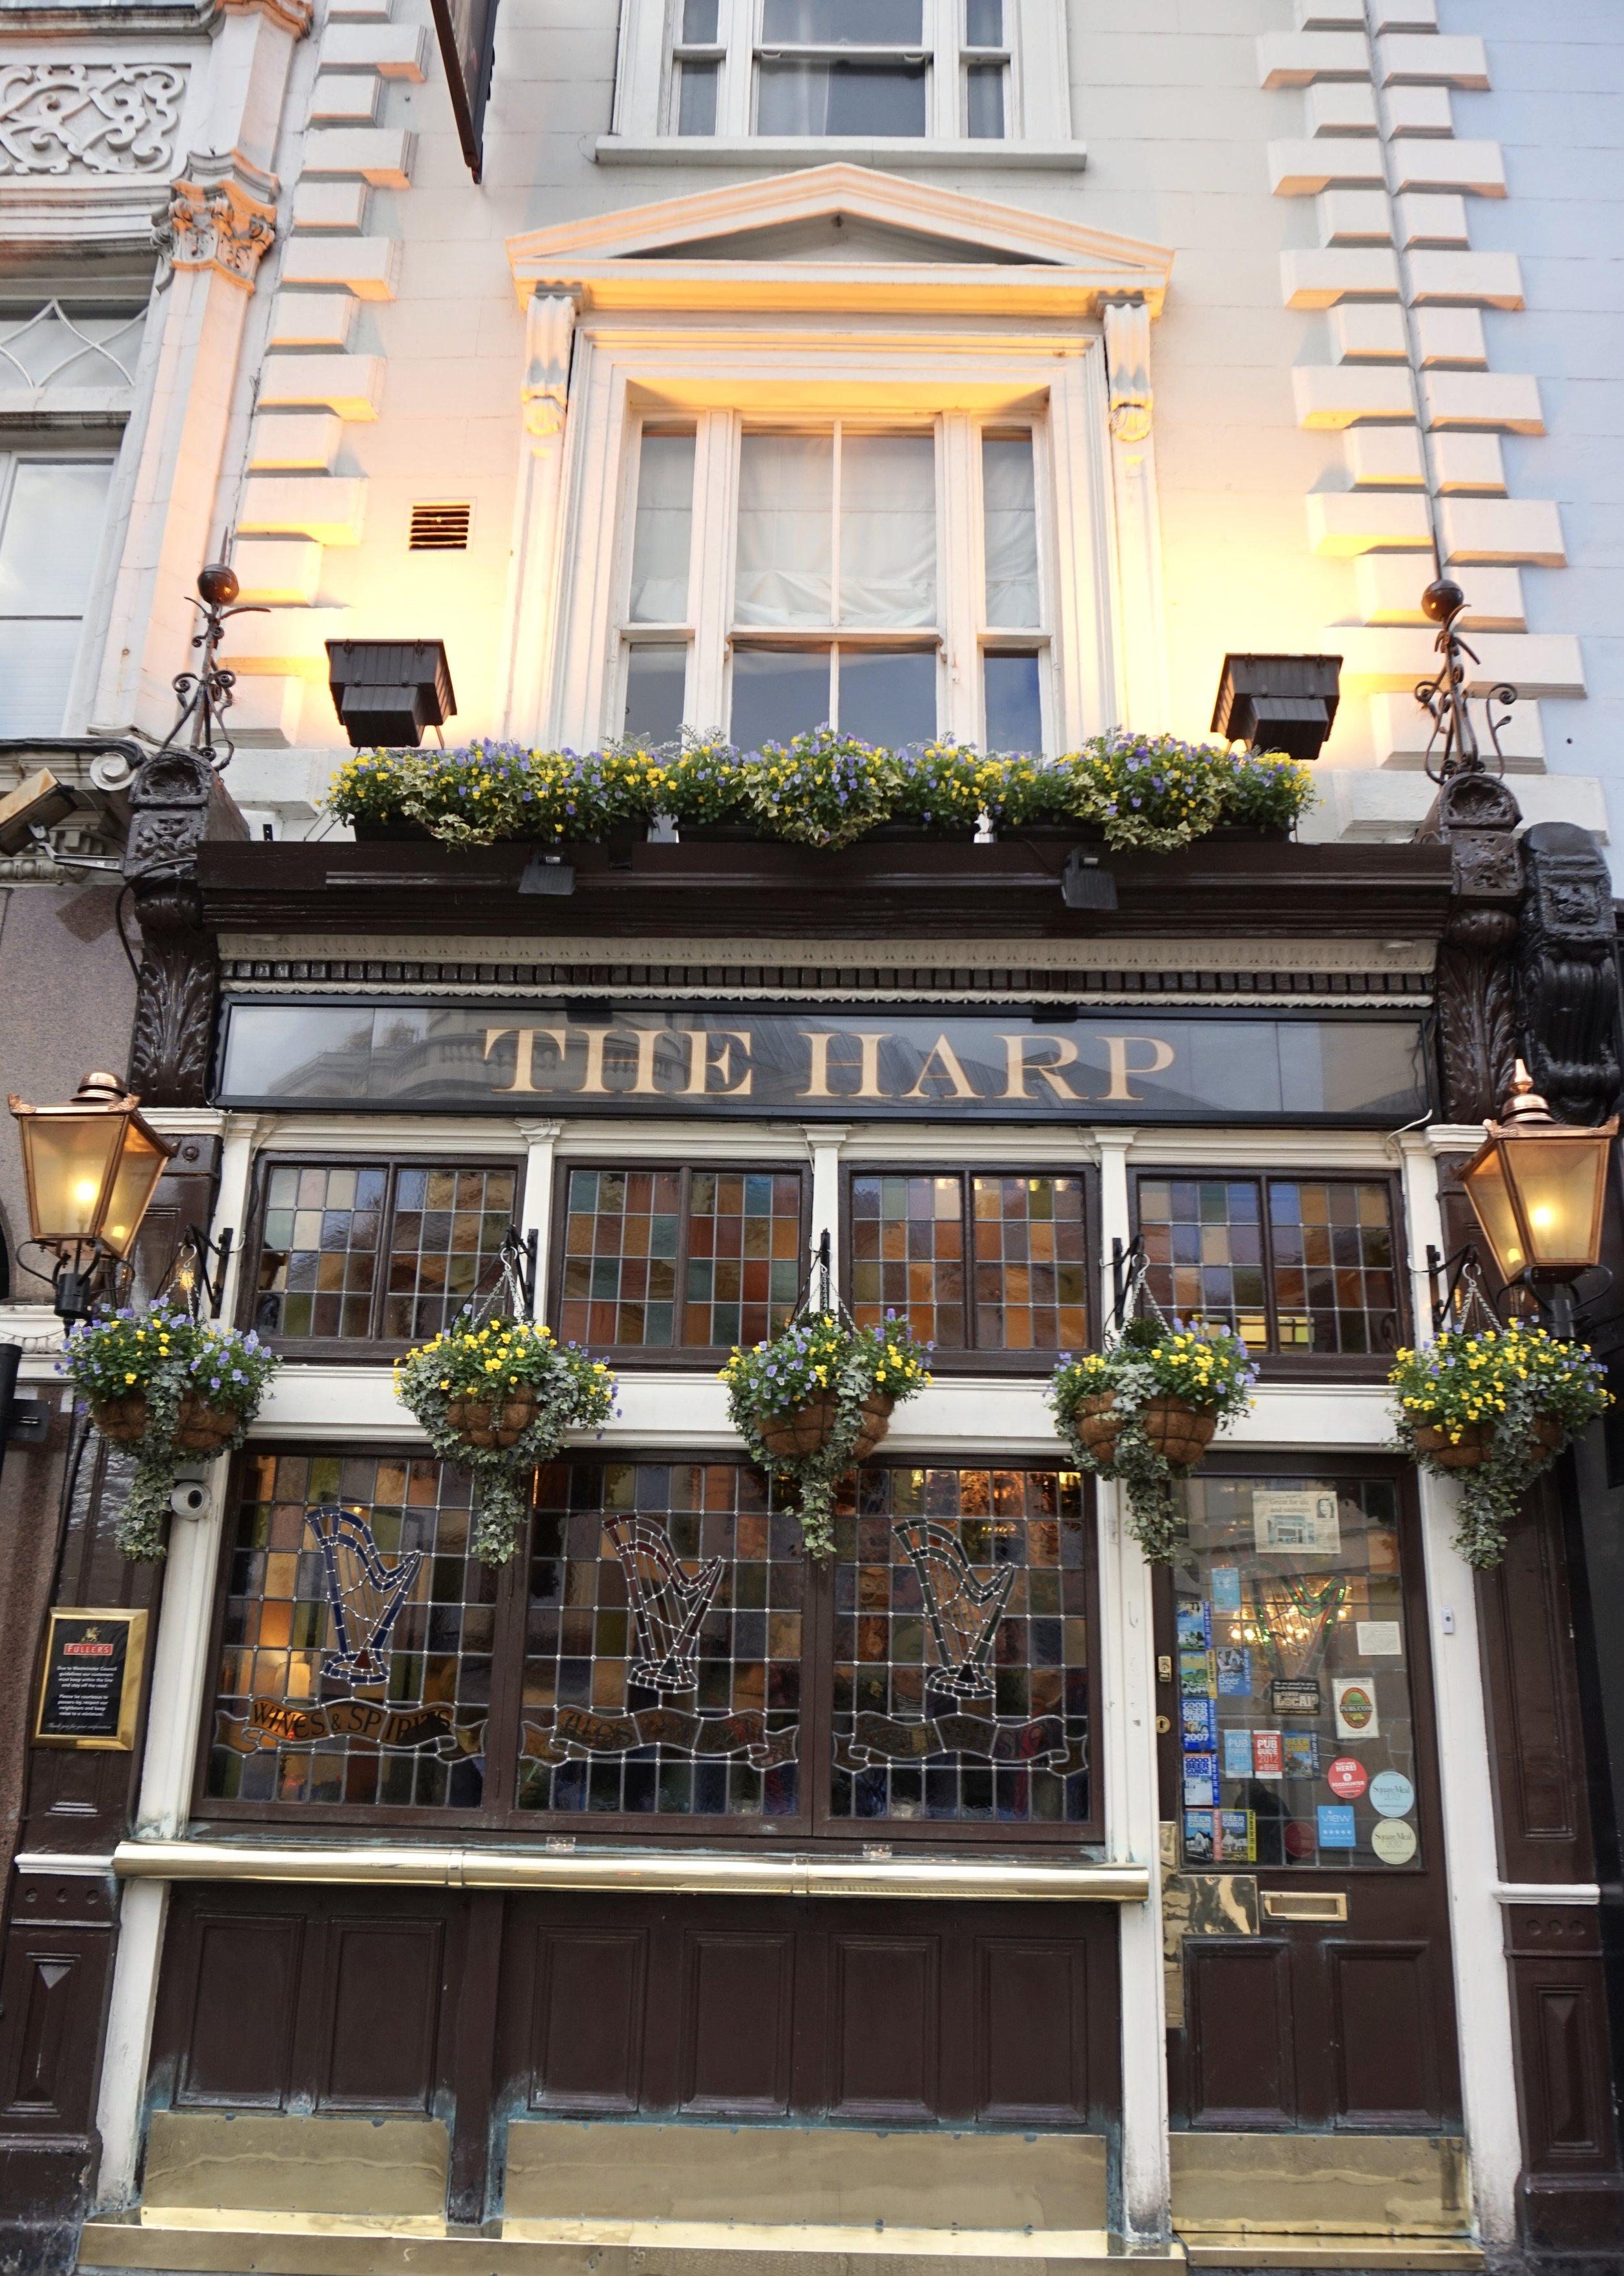 Local London Pub